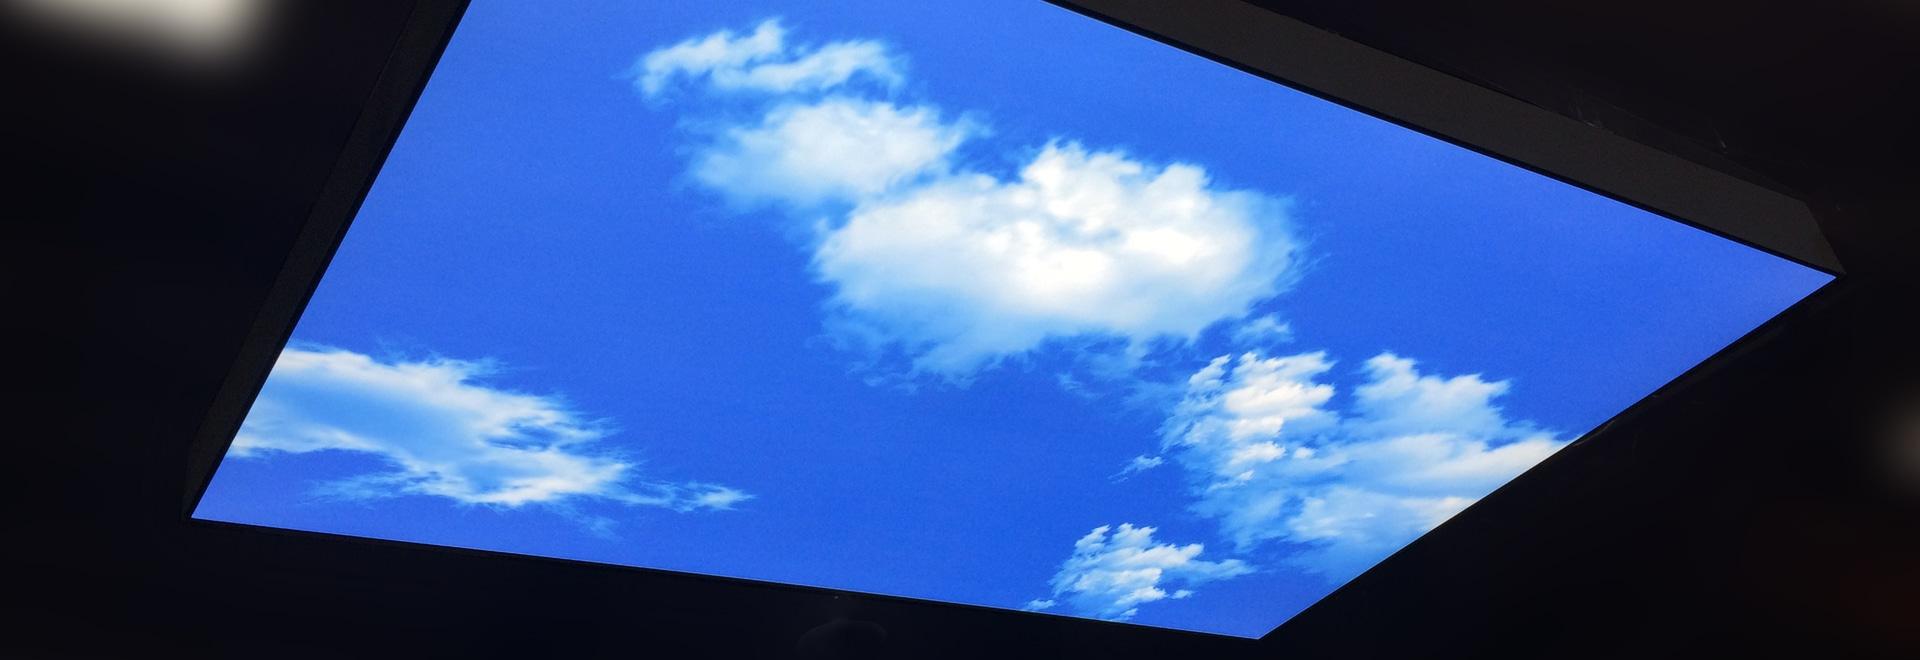 Luce di cielo